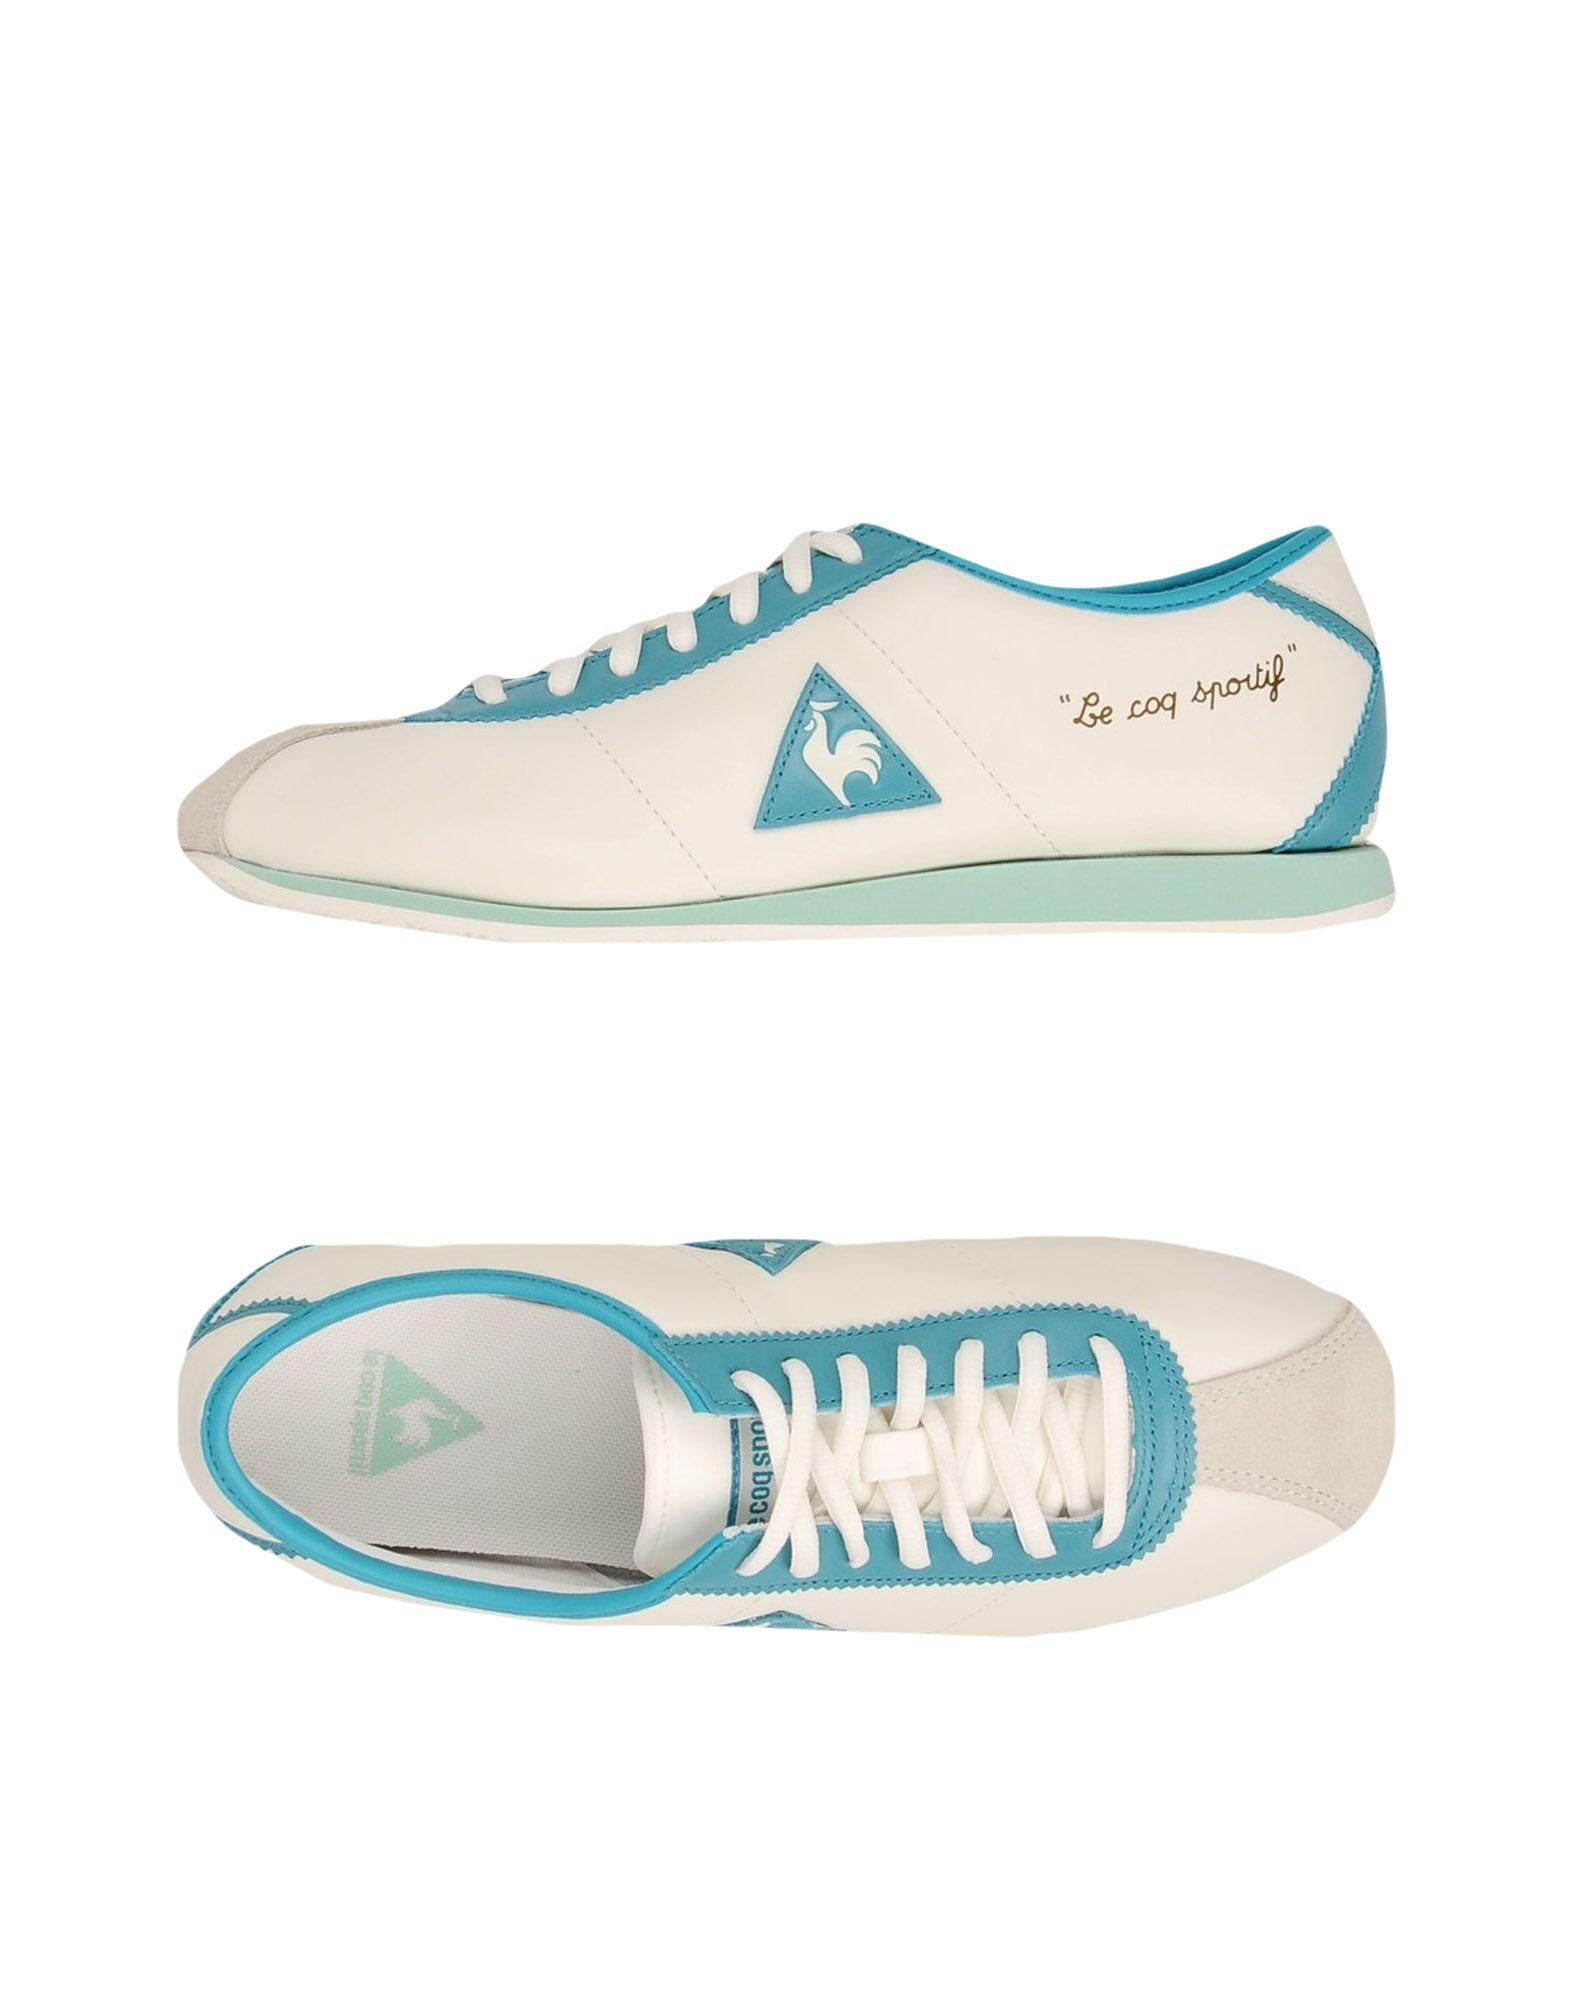 Sneakers Le Coq Sportif Donna  Azstyle Gum - Donna Sportif - 11289101OH 683ccd